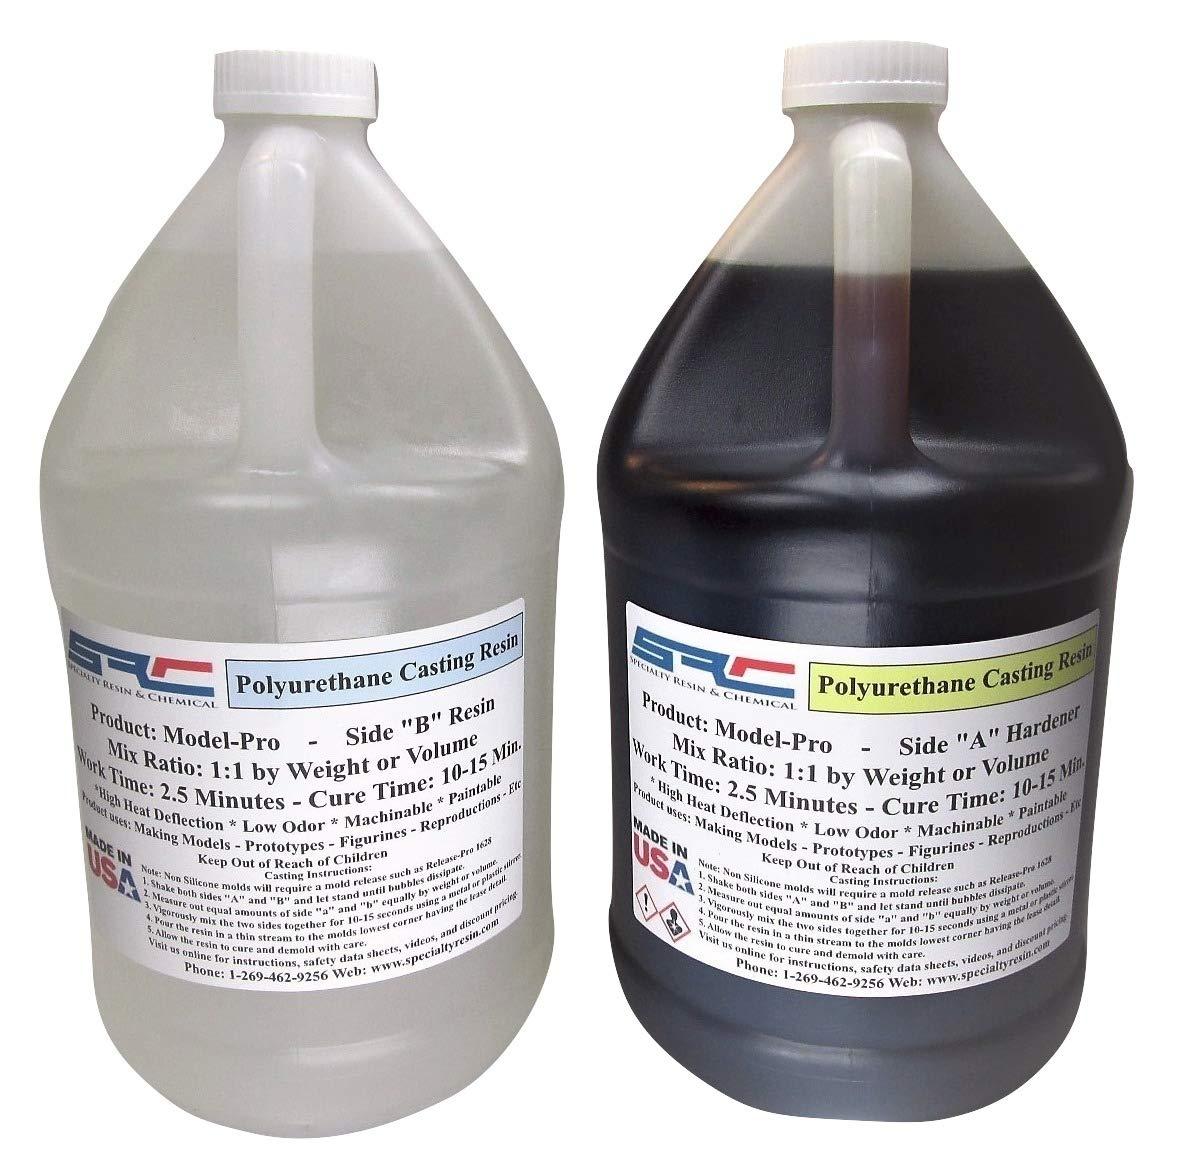 Model-Pro Polyurethane Casting Resin Liquid Plastic for Making Models and Crafts - 2 Gallon Kit